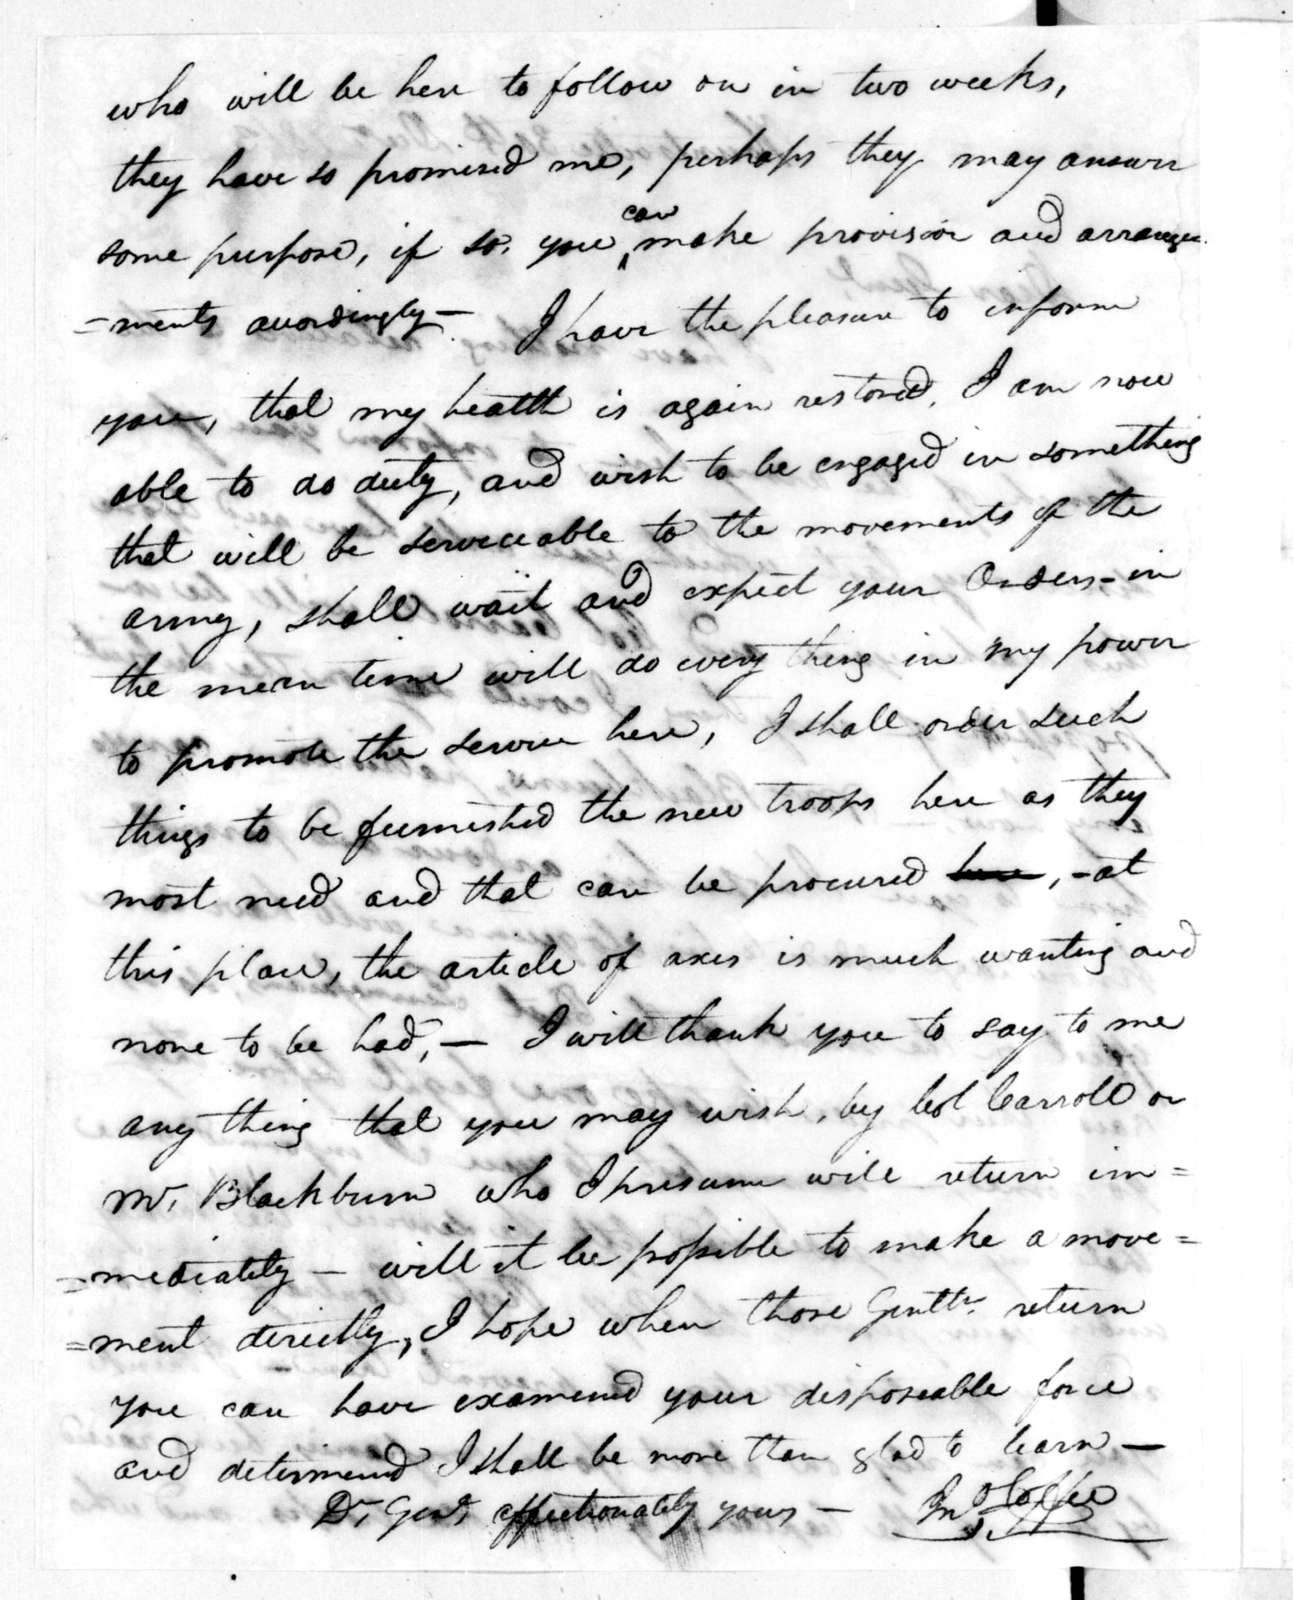 John Coffee to Andrew Jackson, December 30, 1813